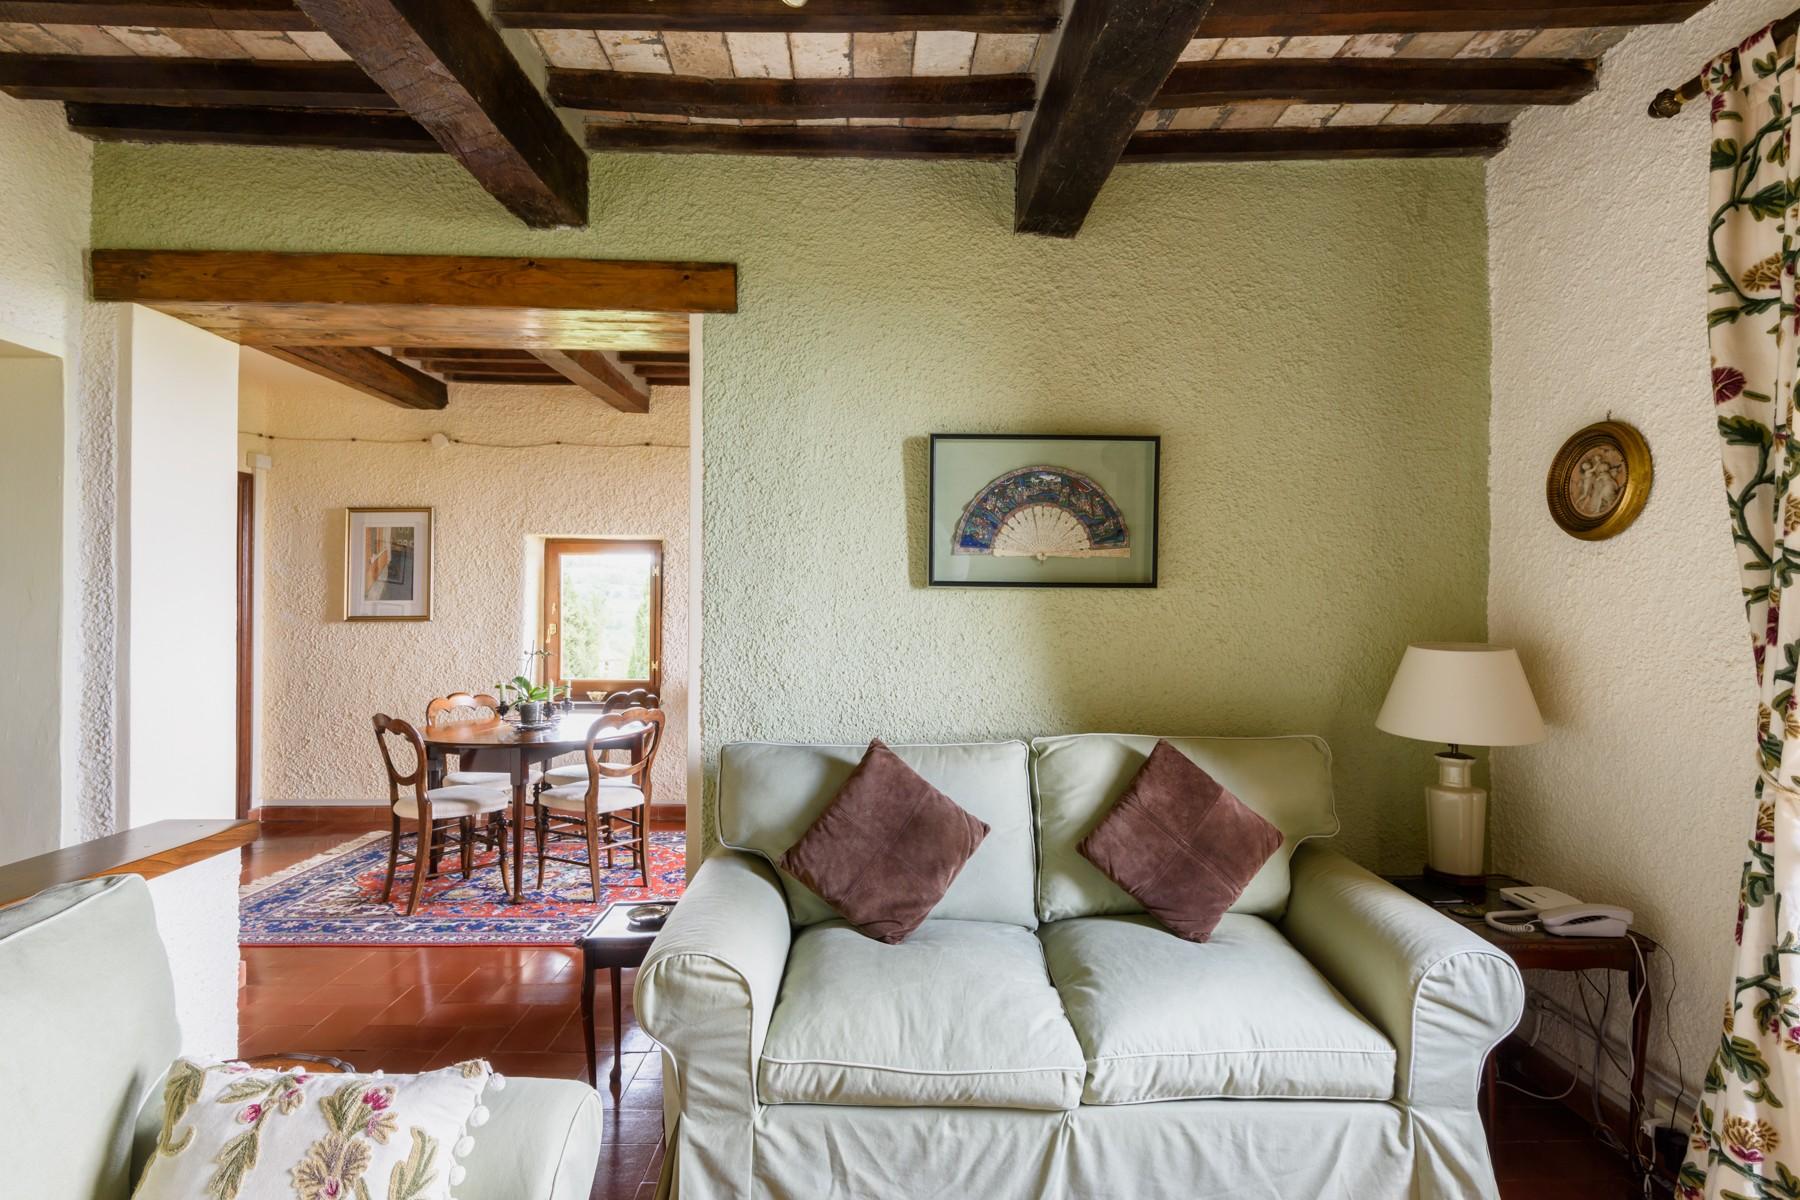 Casa indipendente in Vendita a Semproniano: 4 locali, 220 mq - Foto 11